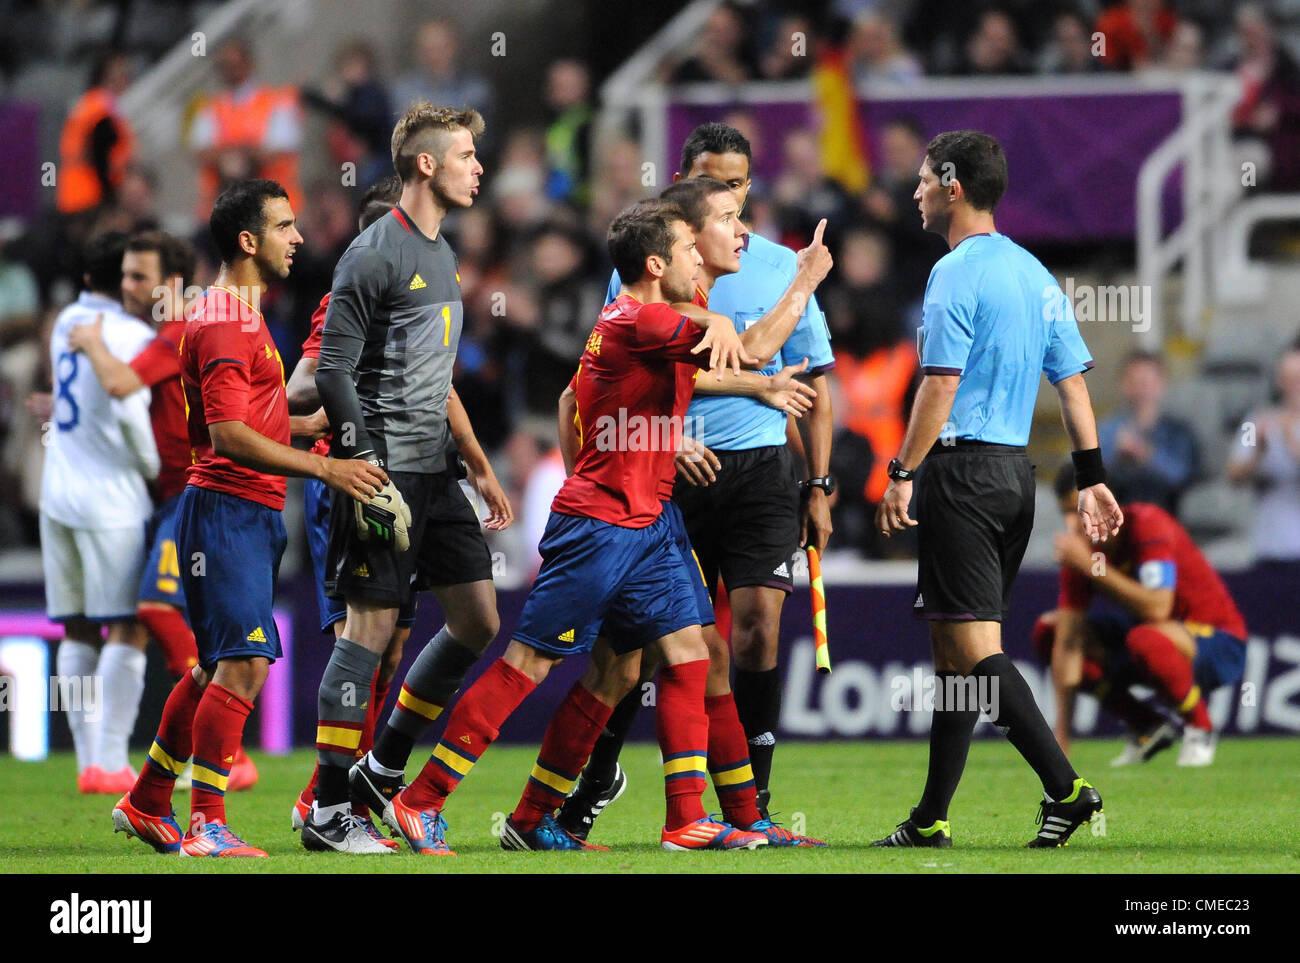 Spanien-Spieler KONFRONTIEREN Schiedsrichter Spanien V HONDURAS ST JAMES PARK NEWCASTLE ENGLAND 29. Juli 2012 Stockbild